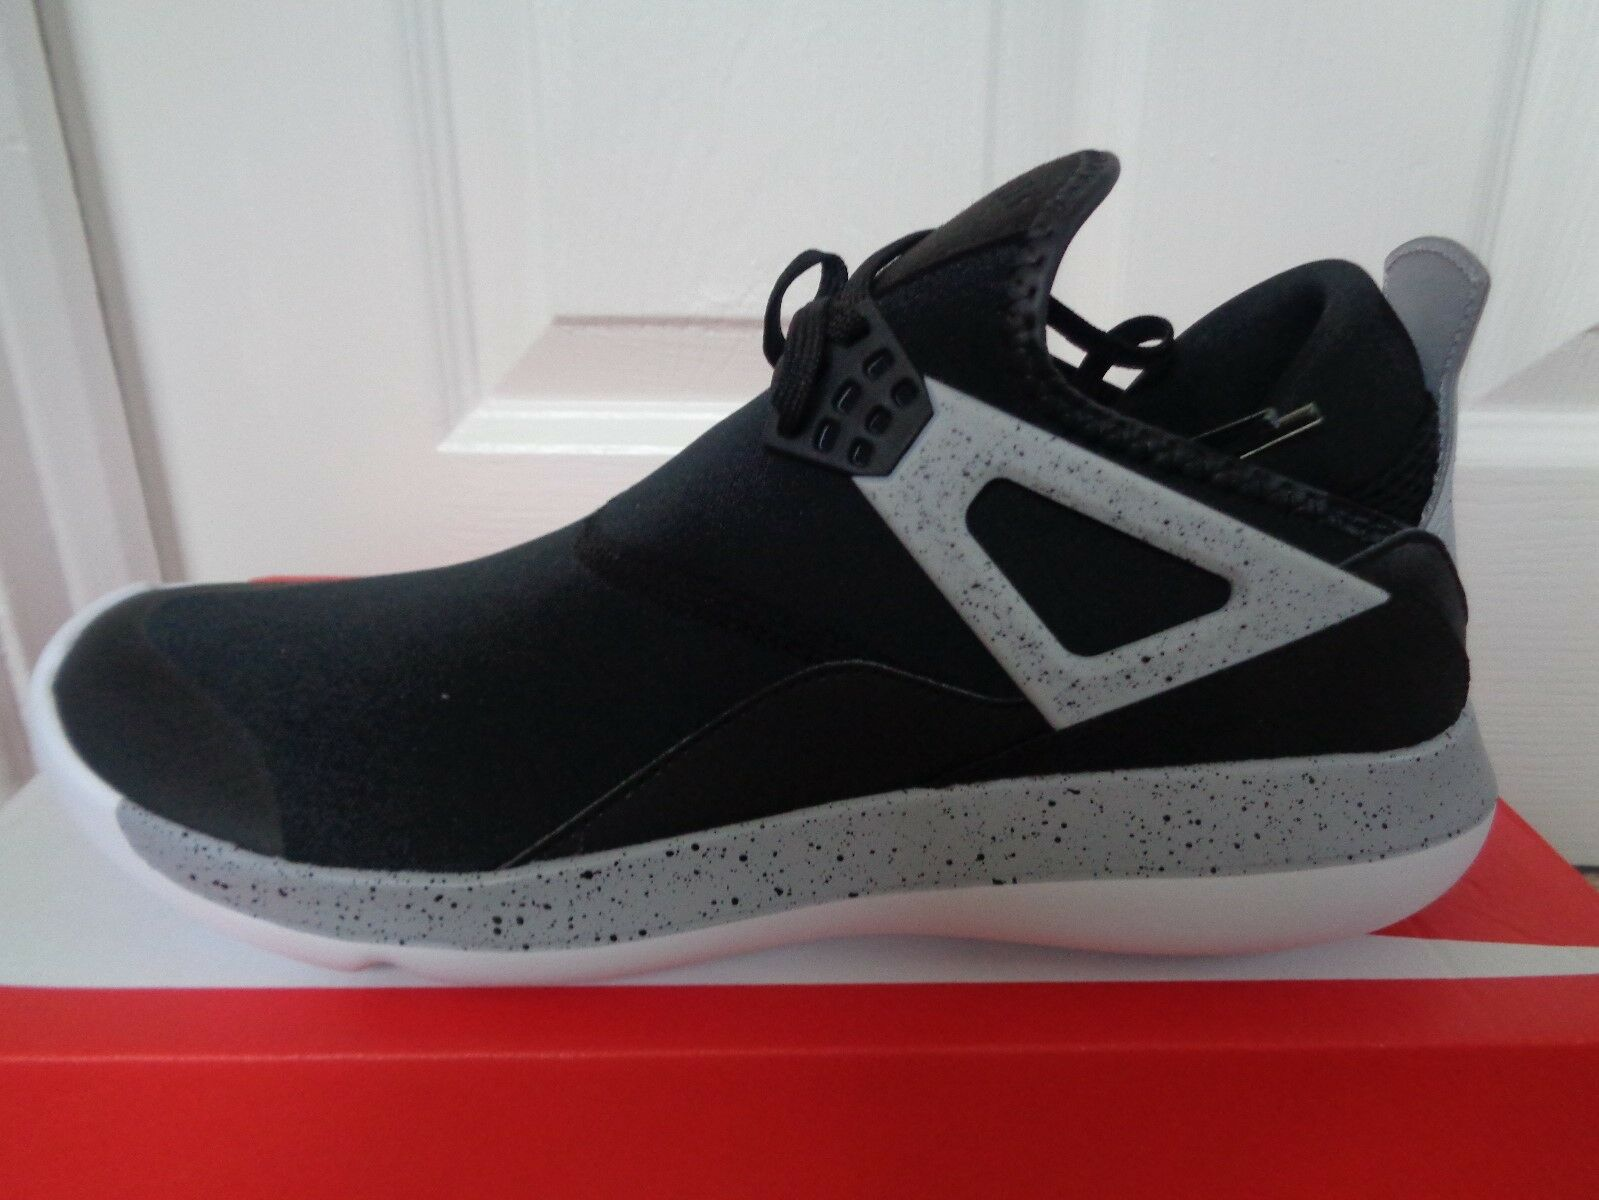 Nike Fly'89 Jordan Fly'89 Nike Entrainement Baskets Chaussures 940267 004 UK 8 EU 42.5 US 9 Neuf + Boîte 6dc401